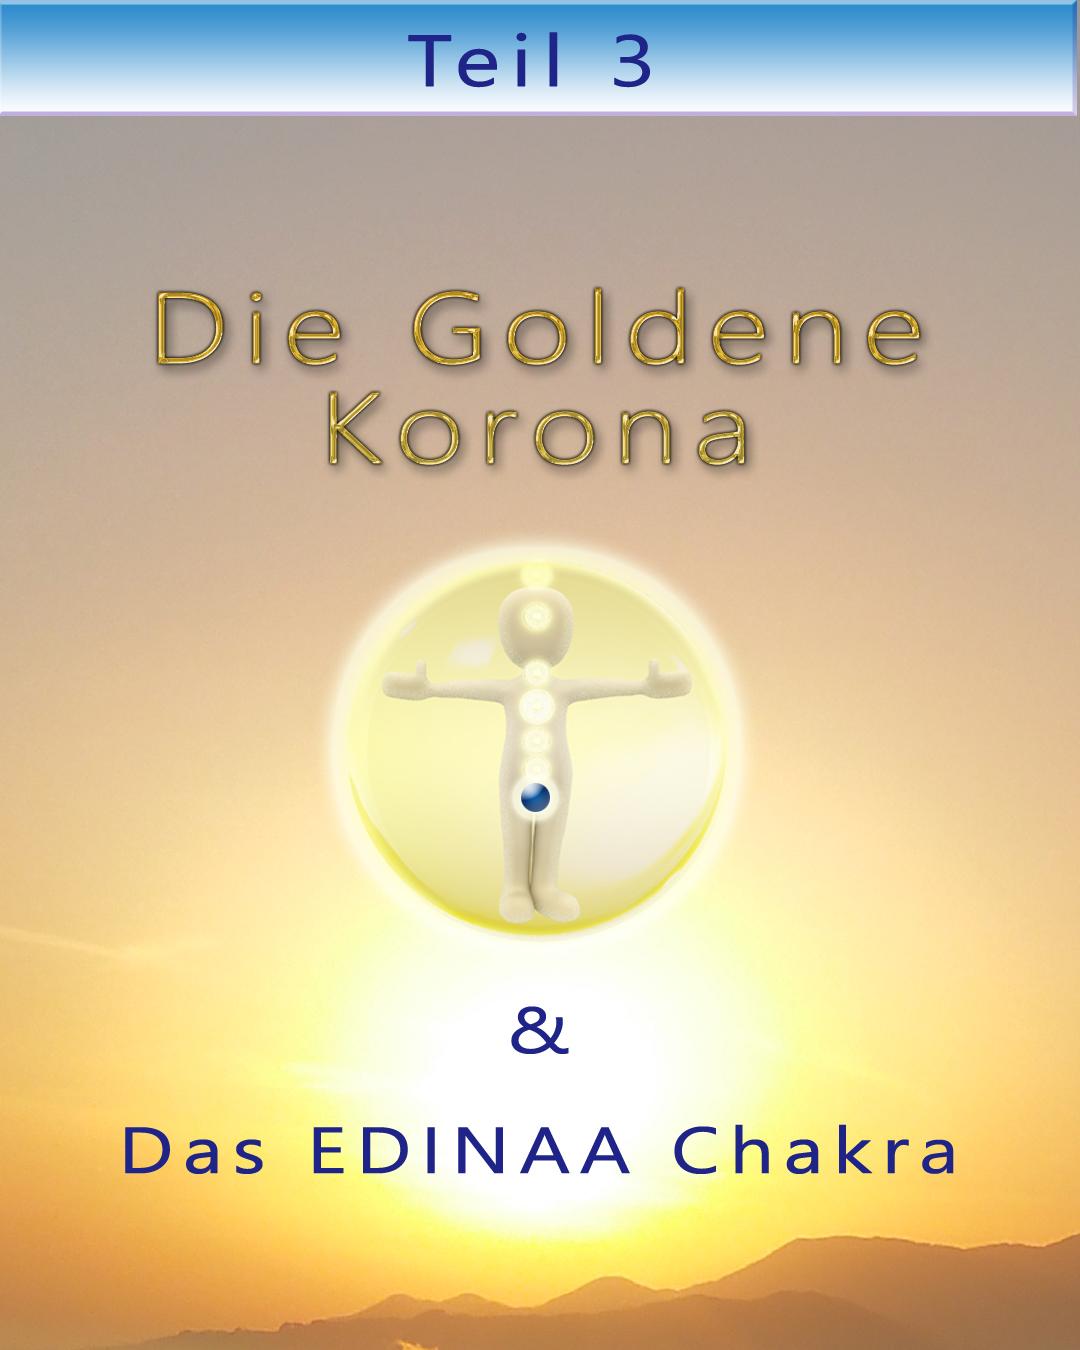 EDINAA Chakra